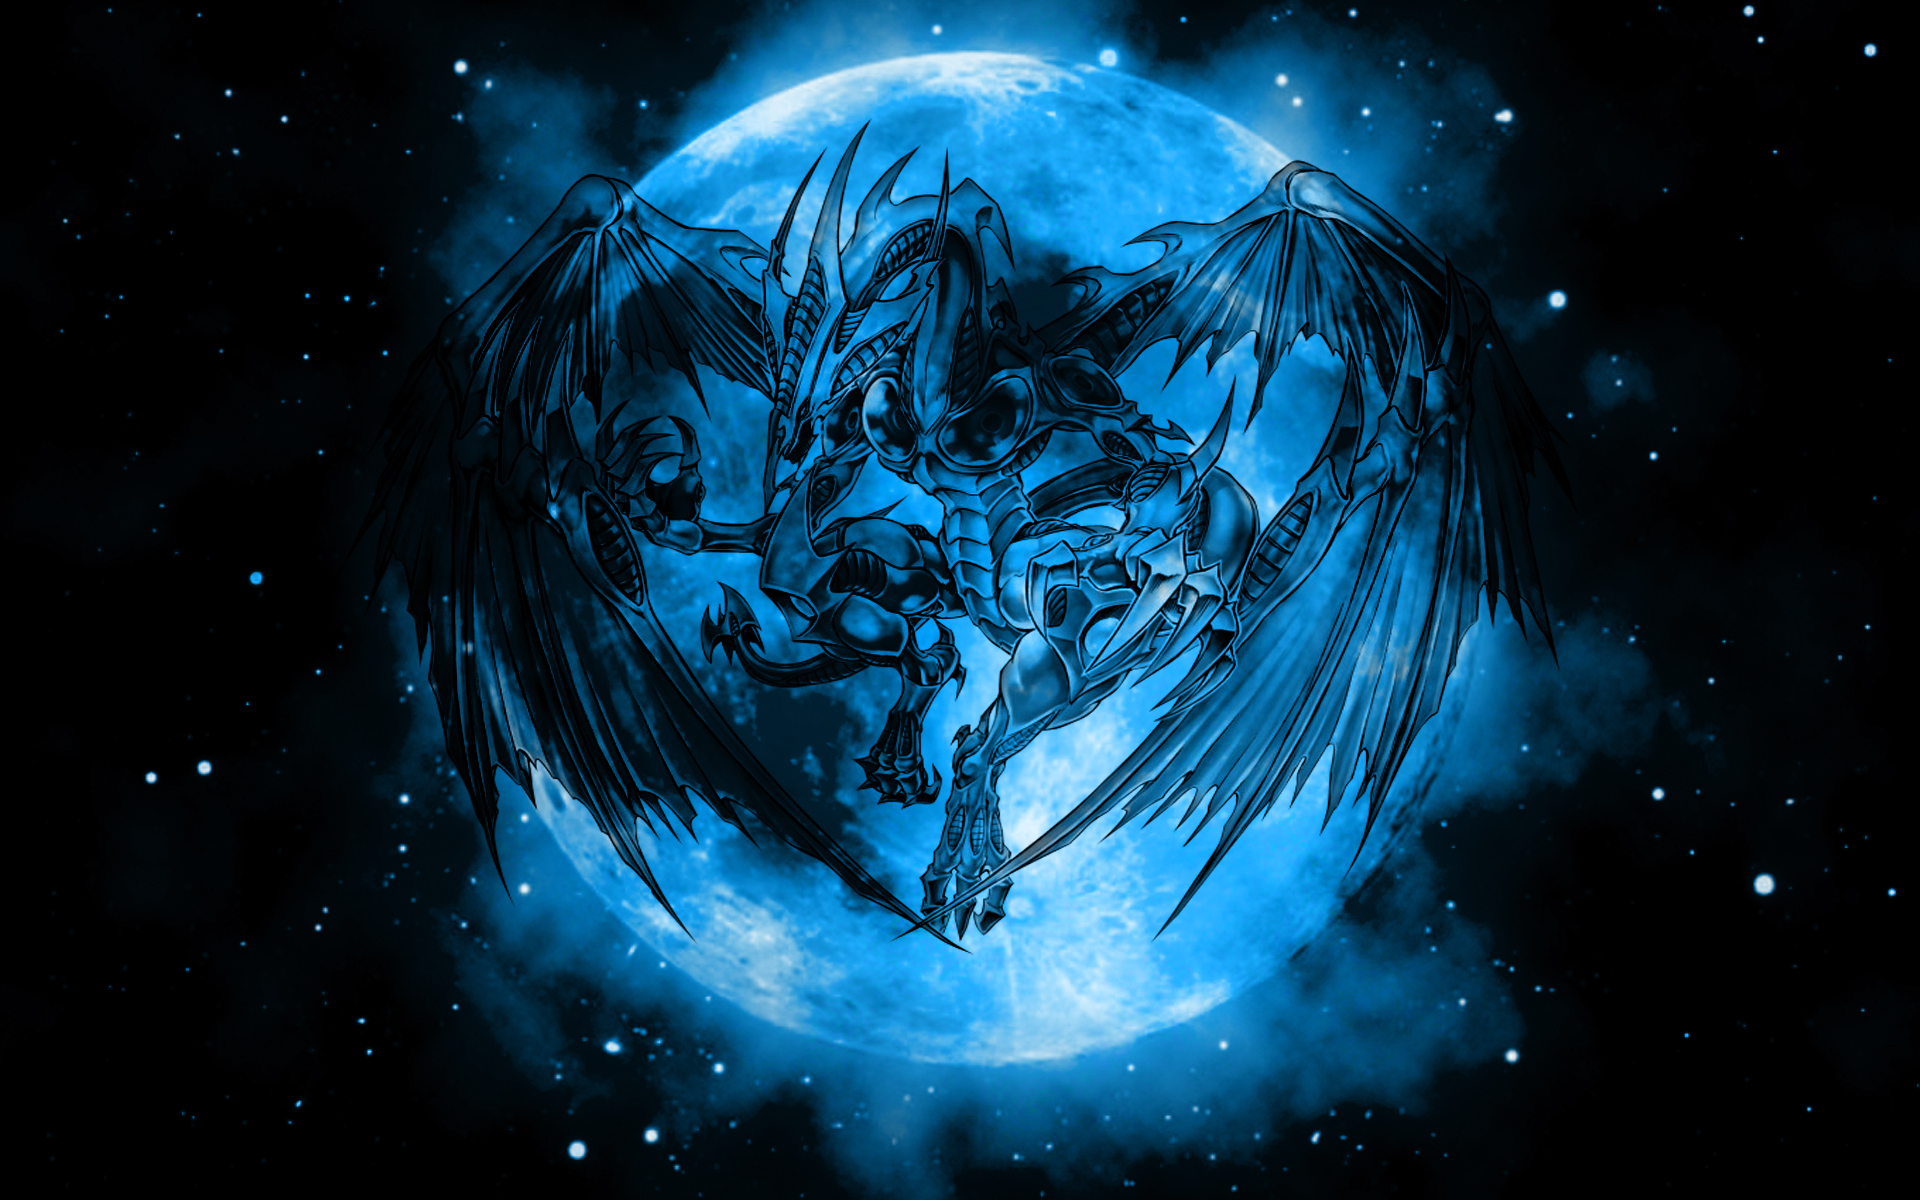 drawings 2010 2015 alexeiyuri hd wallpaper of stardust dragon from 1920x1200